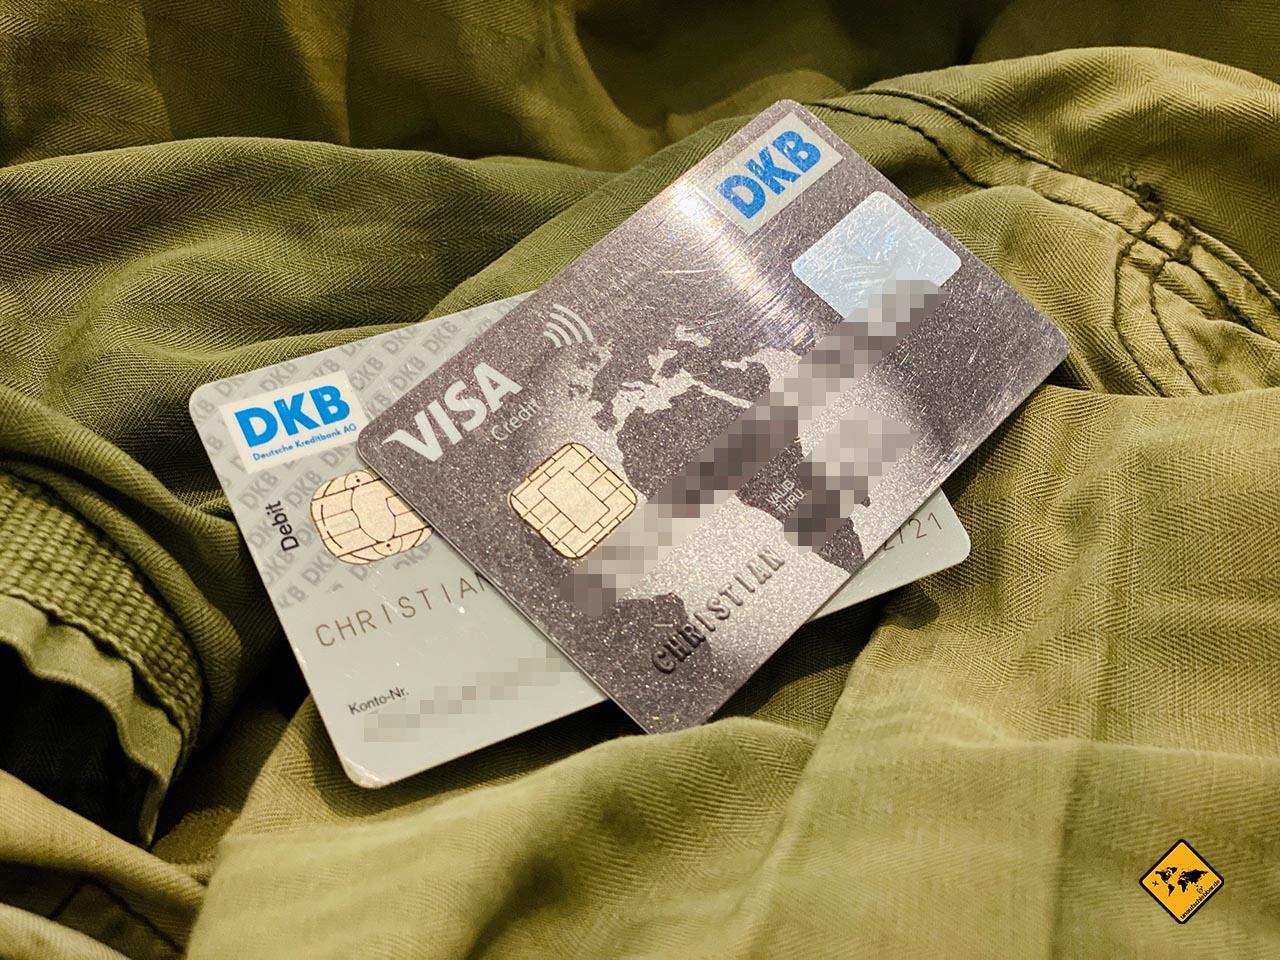 DKB Cash Girokonto Kreditkarte